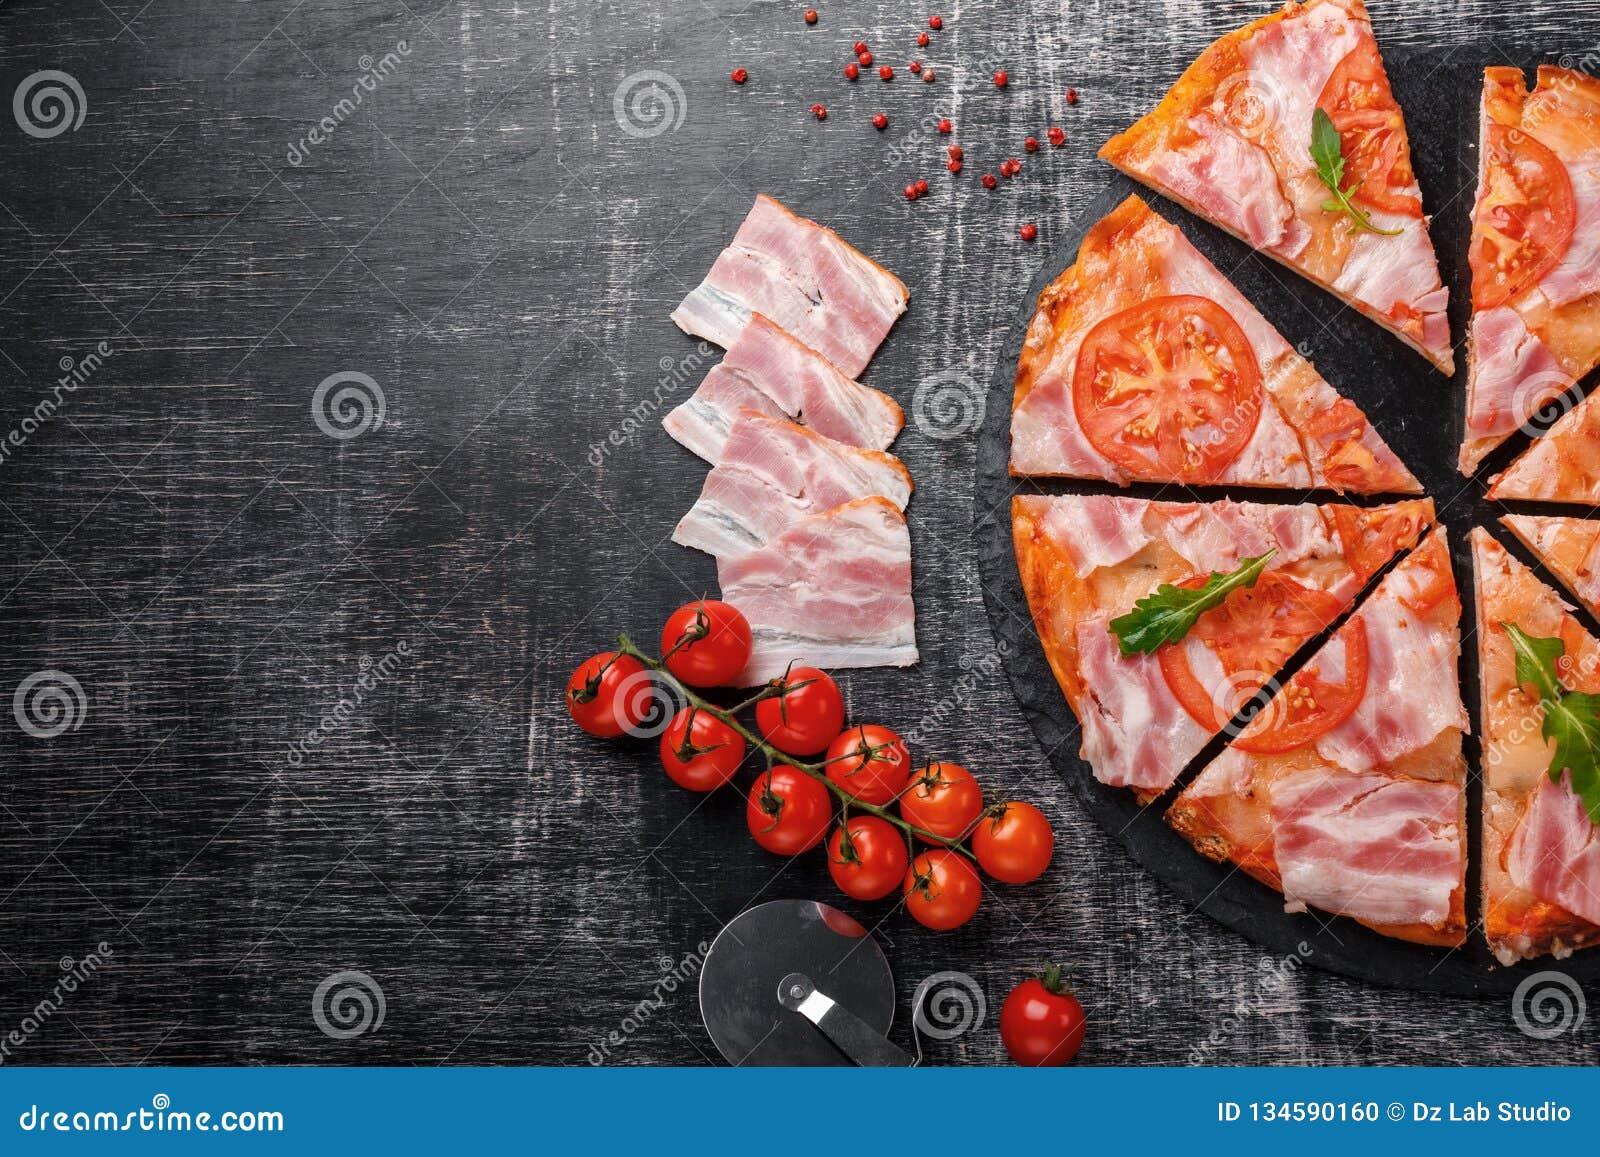 Traditionele Italiaanse pizza met mozarellakaas, ham, tomaten, peper, pepperoniskruiden en verse rucola